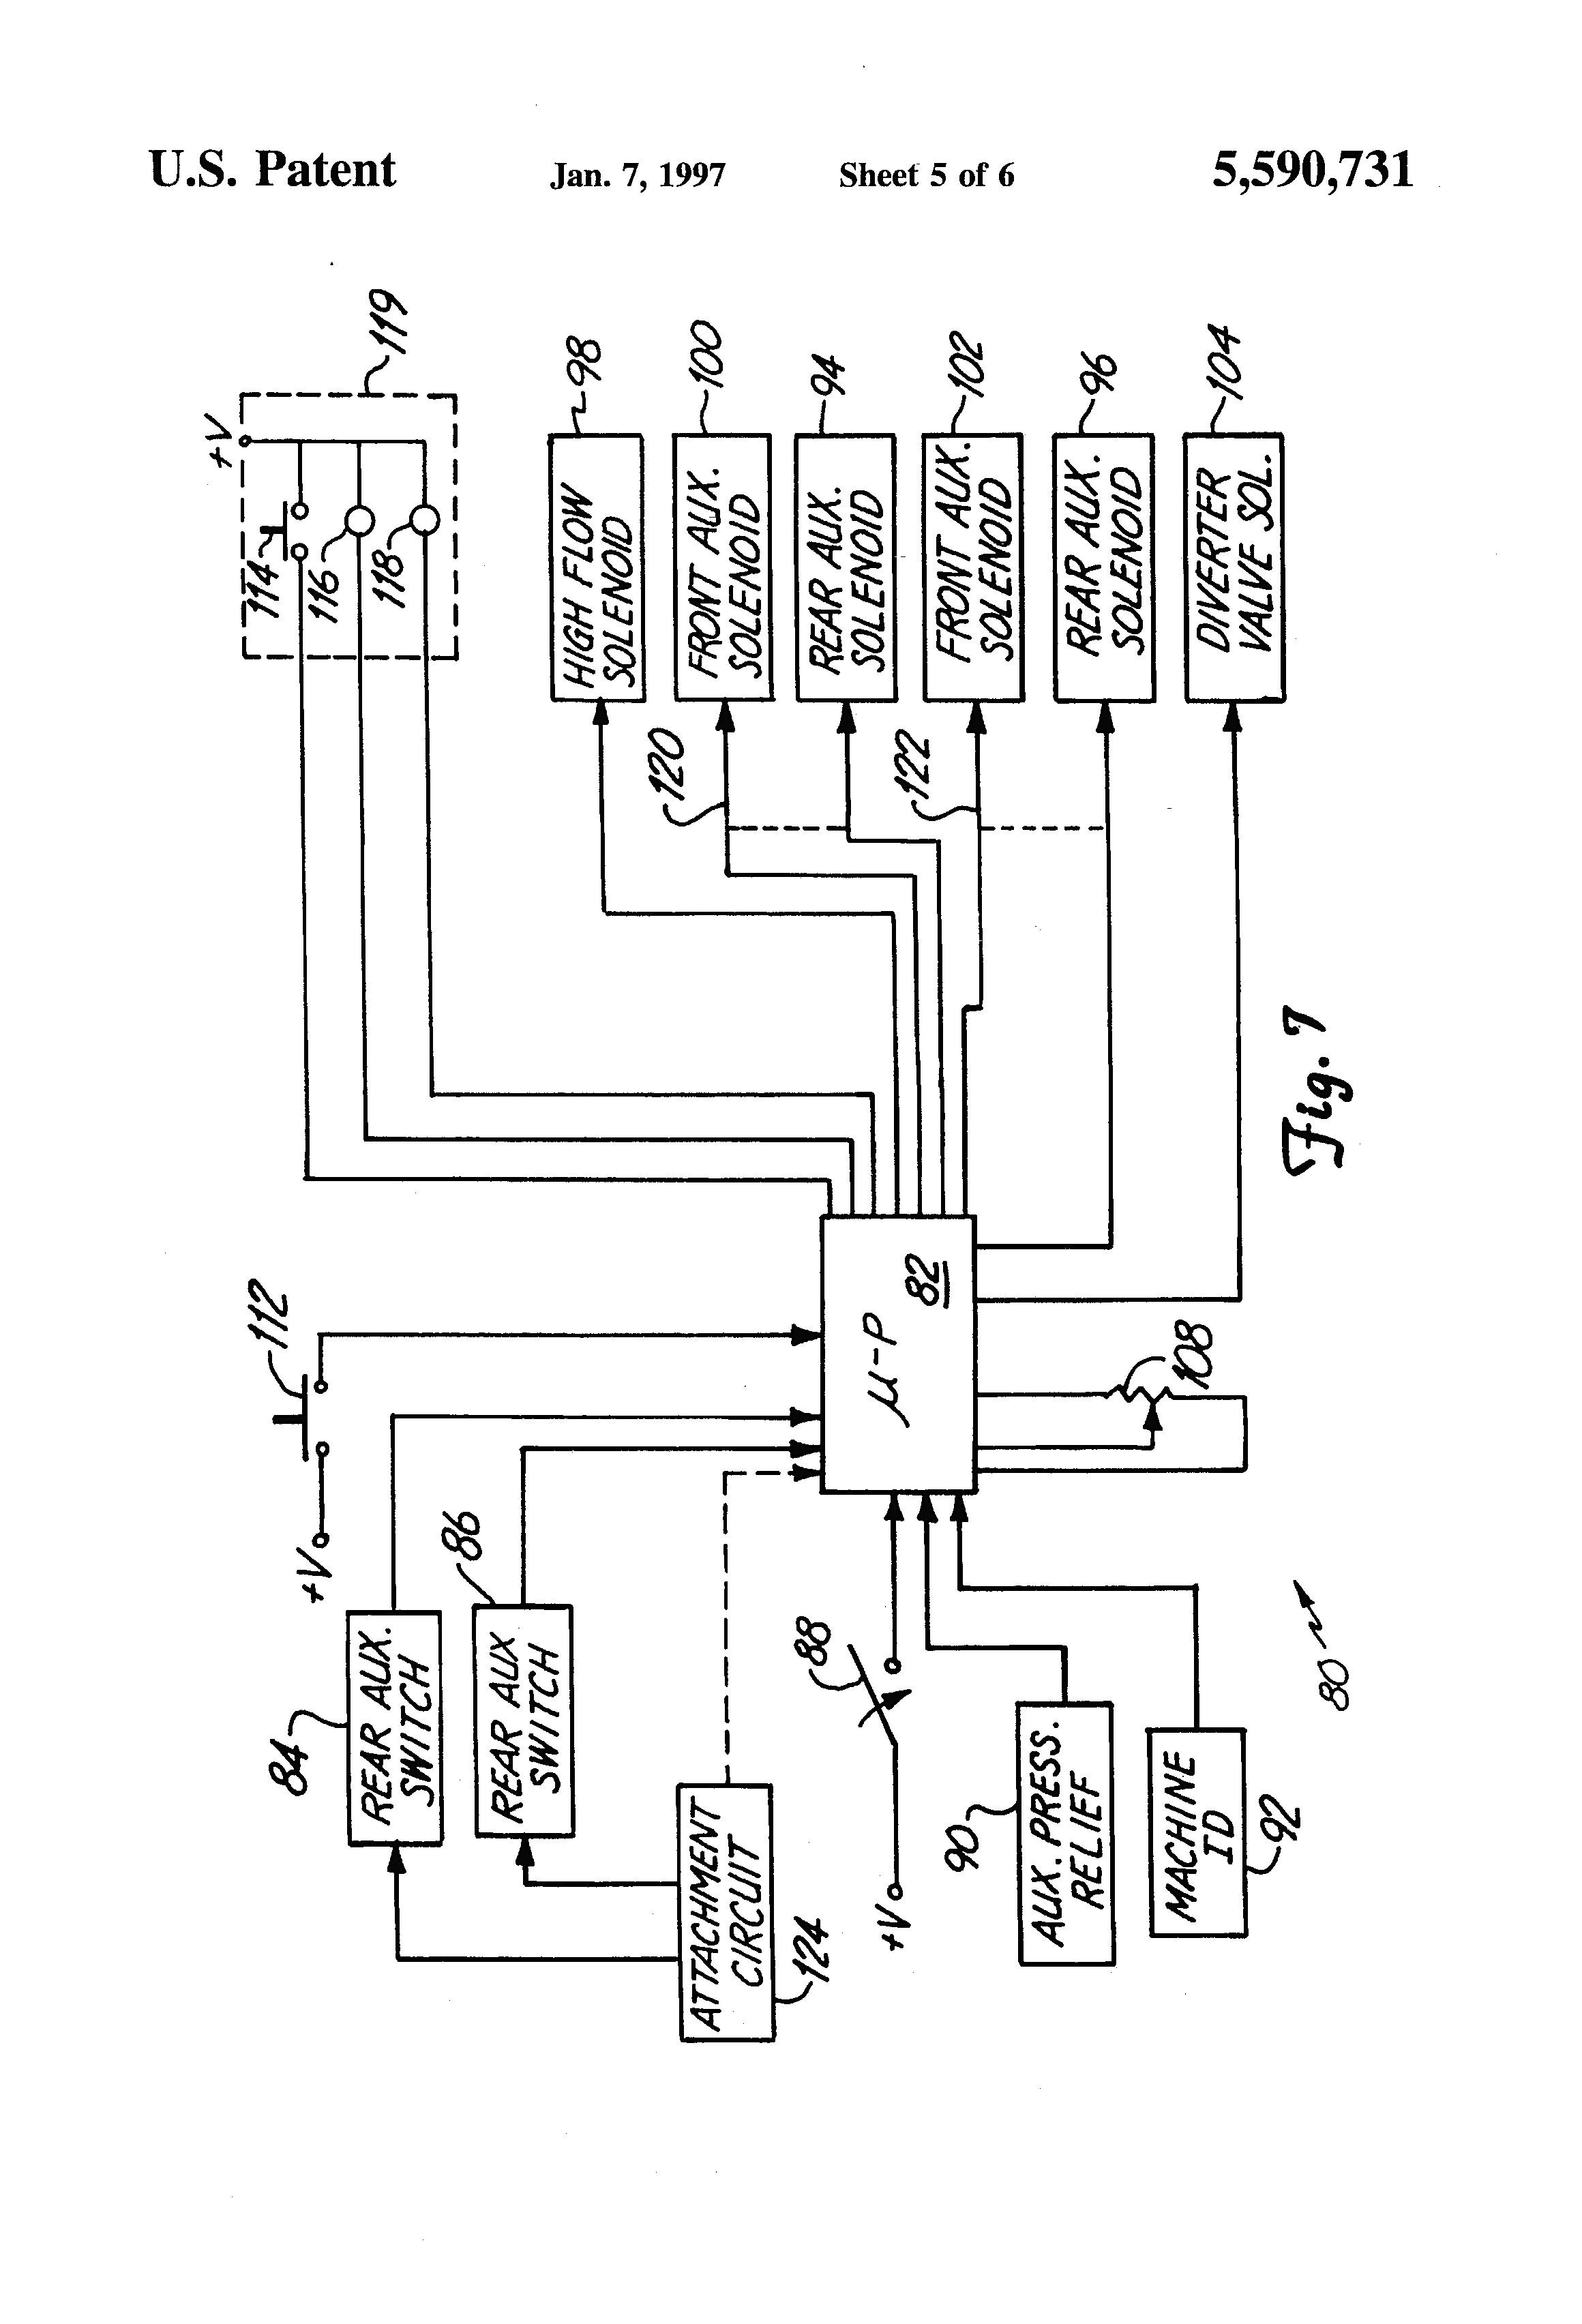 dump trailer pump wiring diagram Download-Astounding Monarch Hydraulic Pump Wiring Diagram Best Dump Trailer Dump Trailer Hydraulic Pump Wiring Diagram 8-k